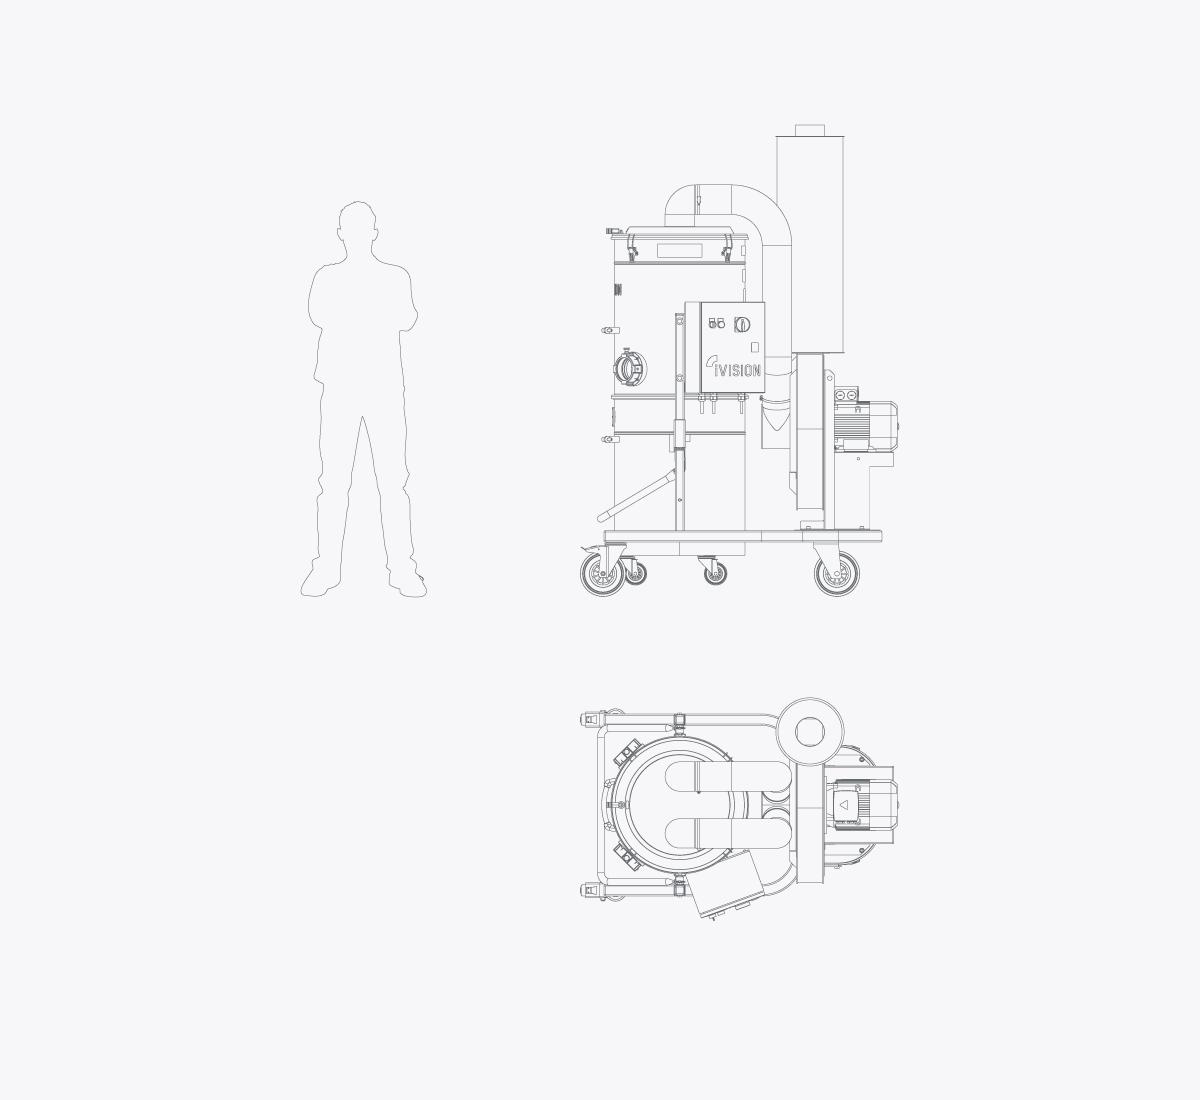 iv3-shoes-line-ventola-dietro-industrial-vacuum-cleaners-ivision-vacuum-dt